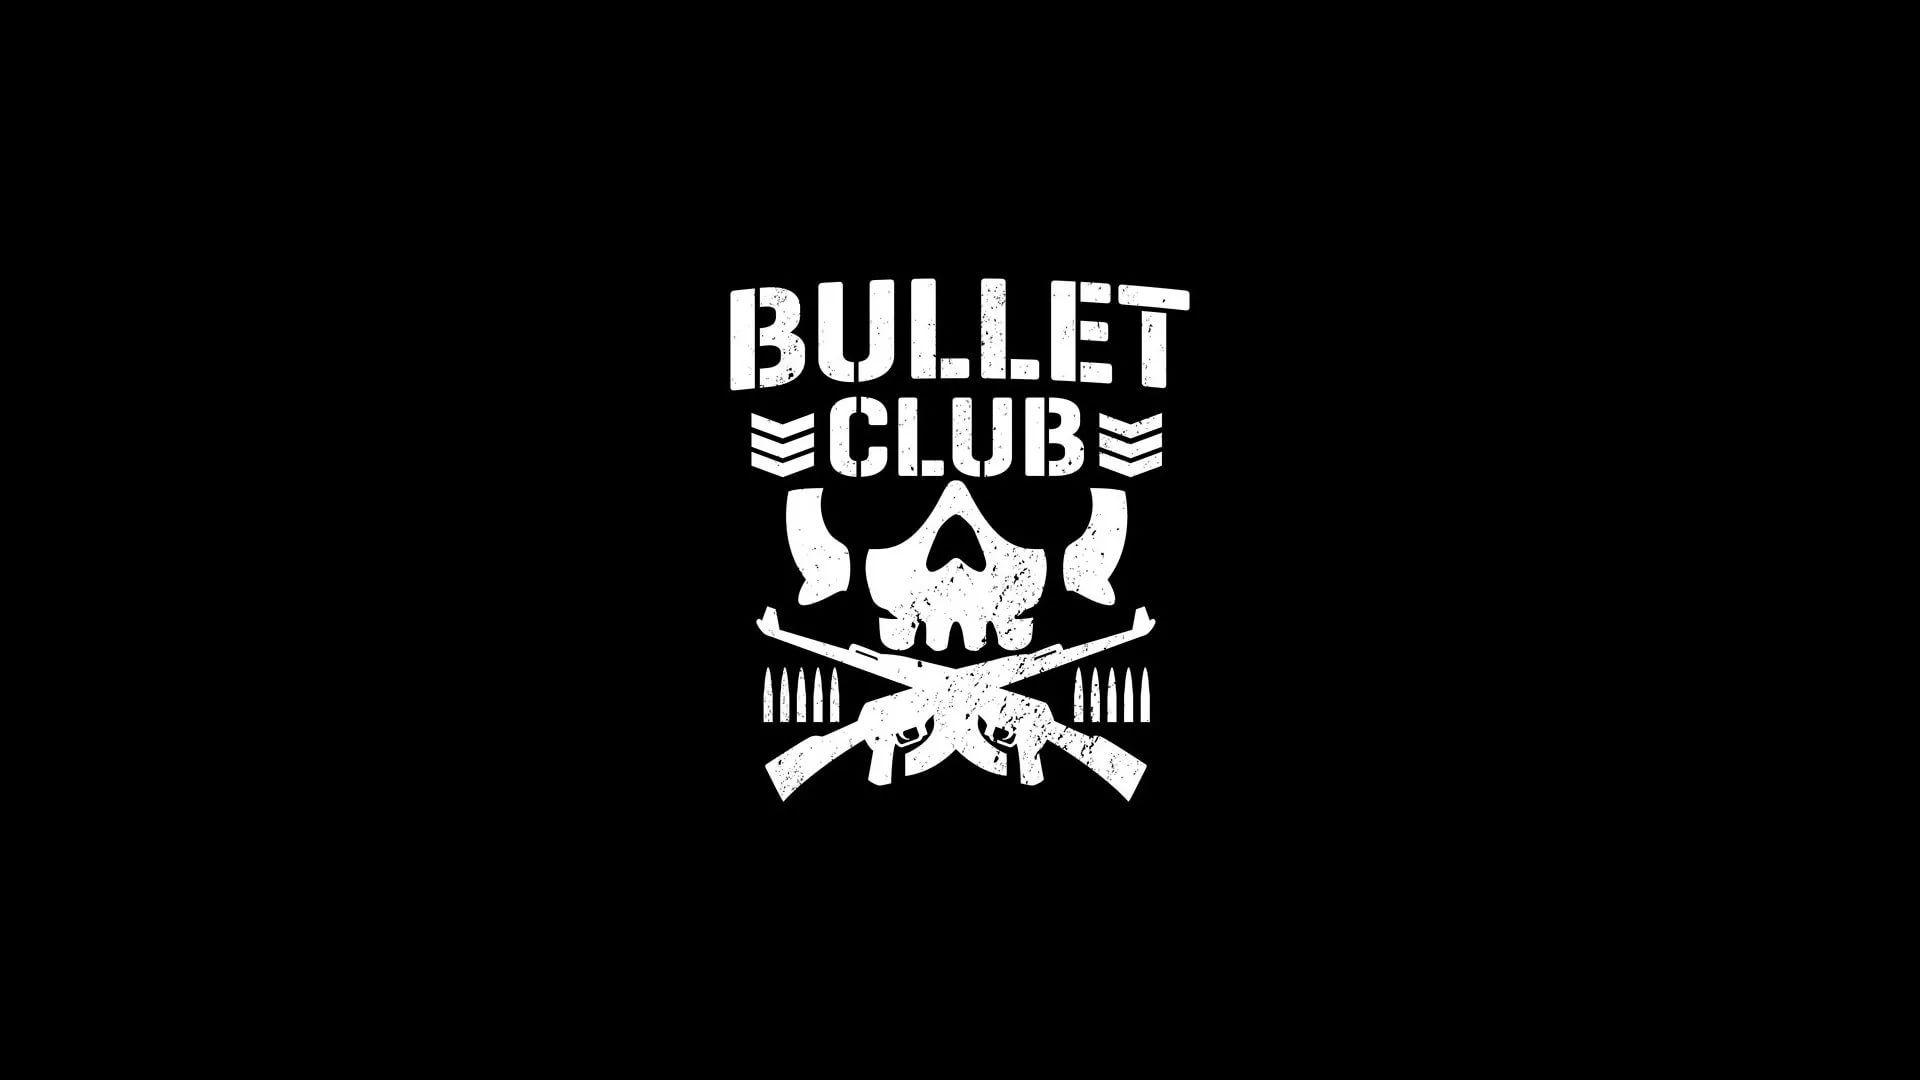 Bullet Club wallpaper theme